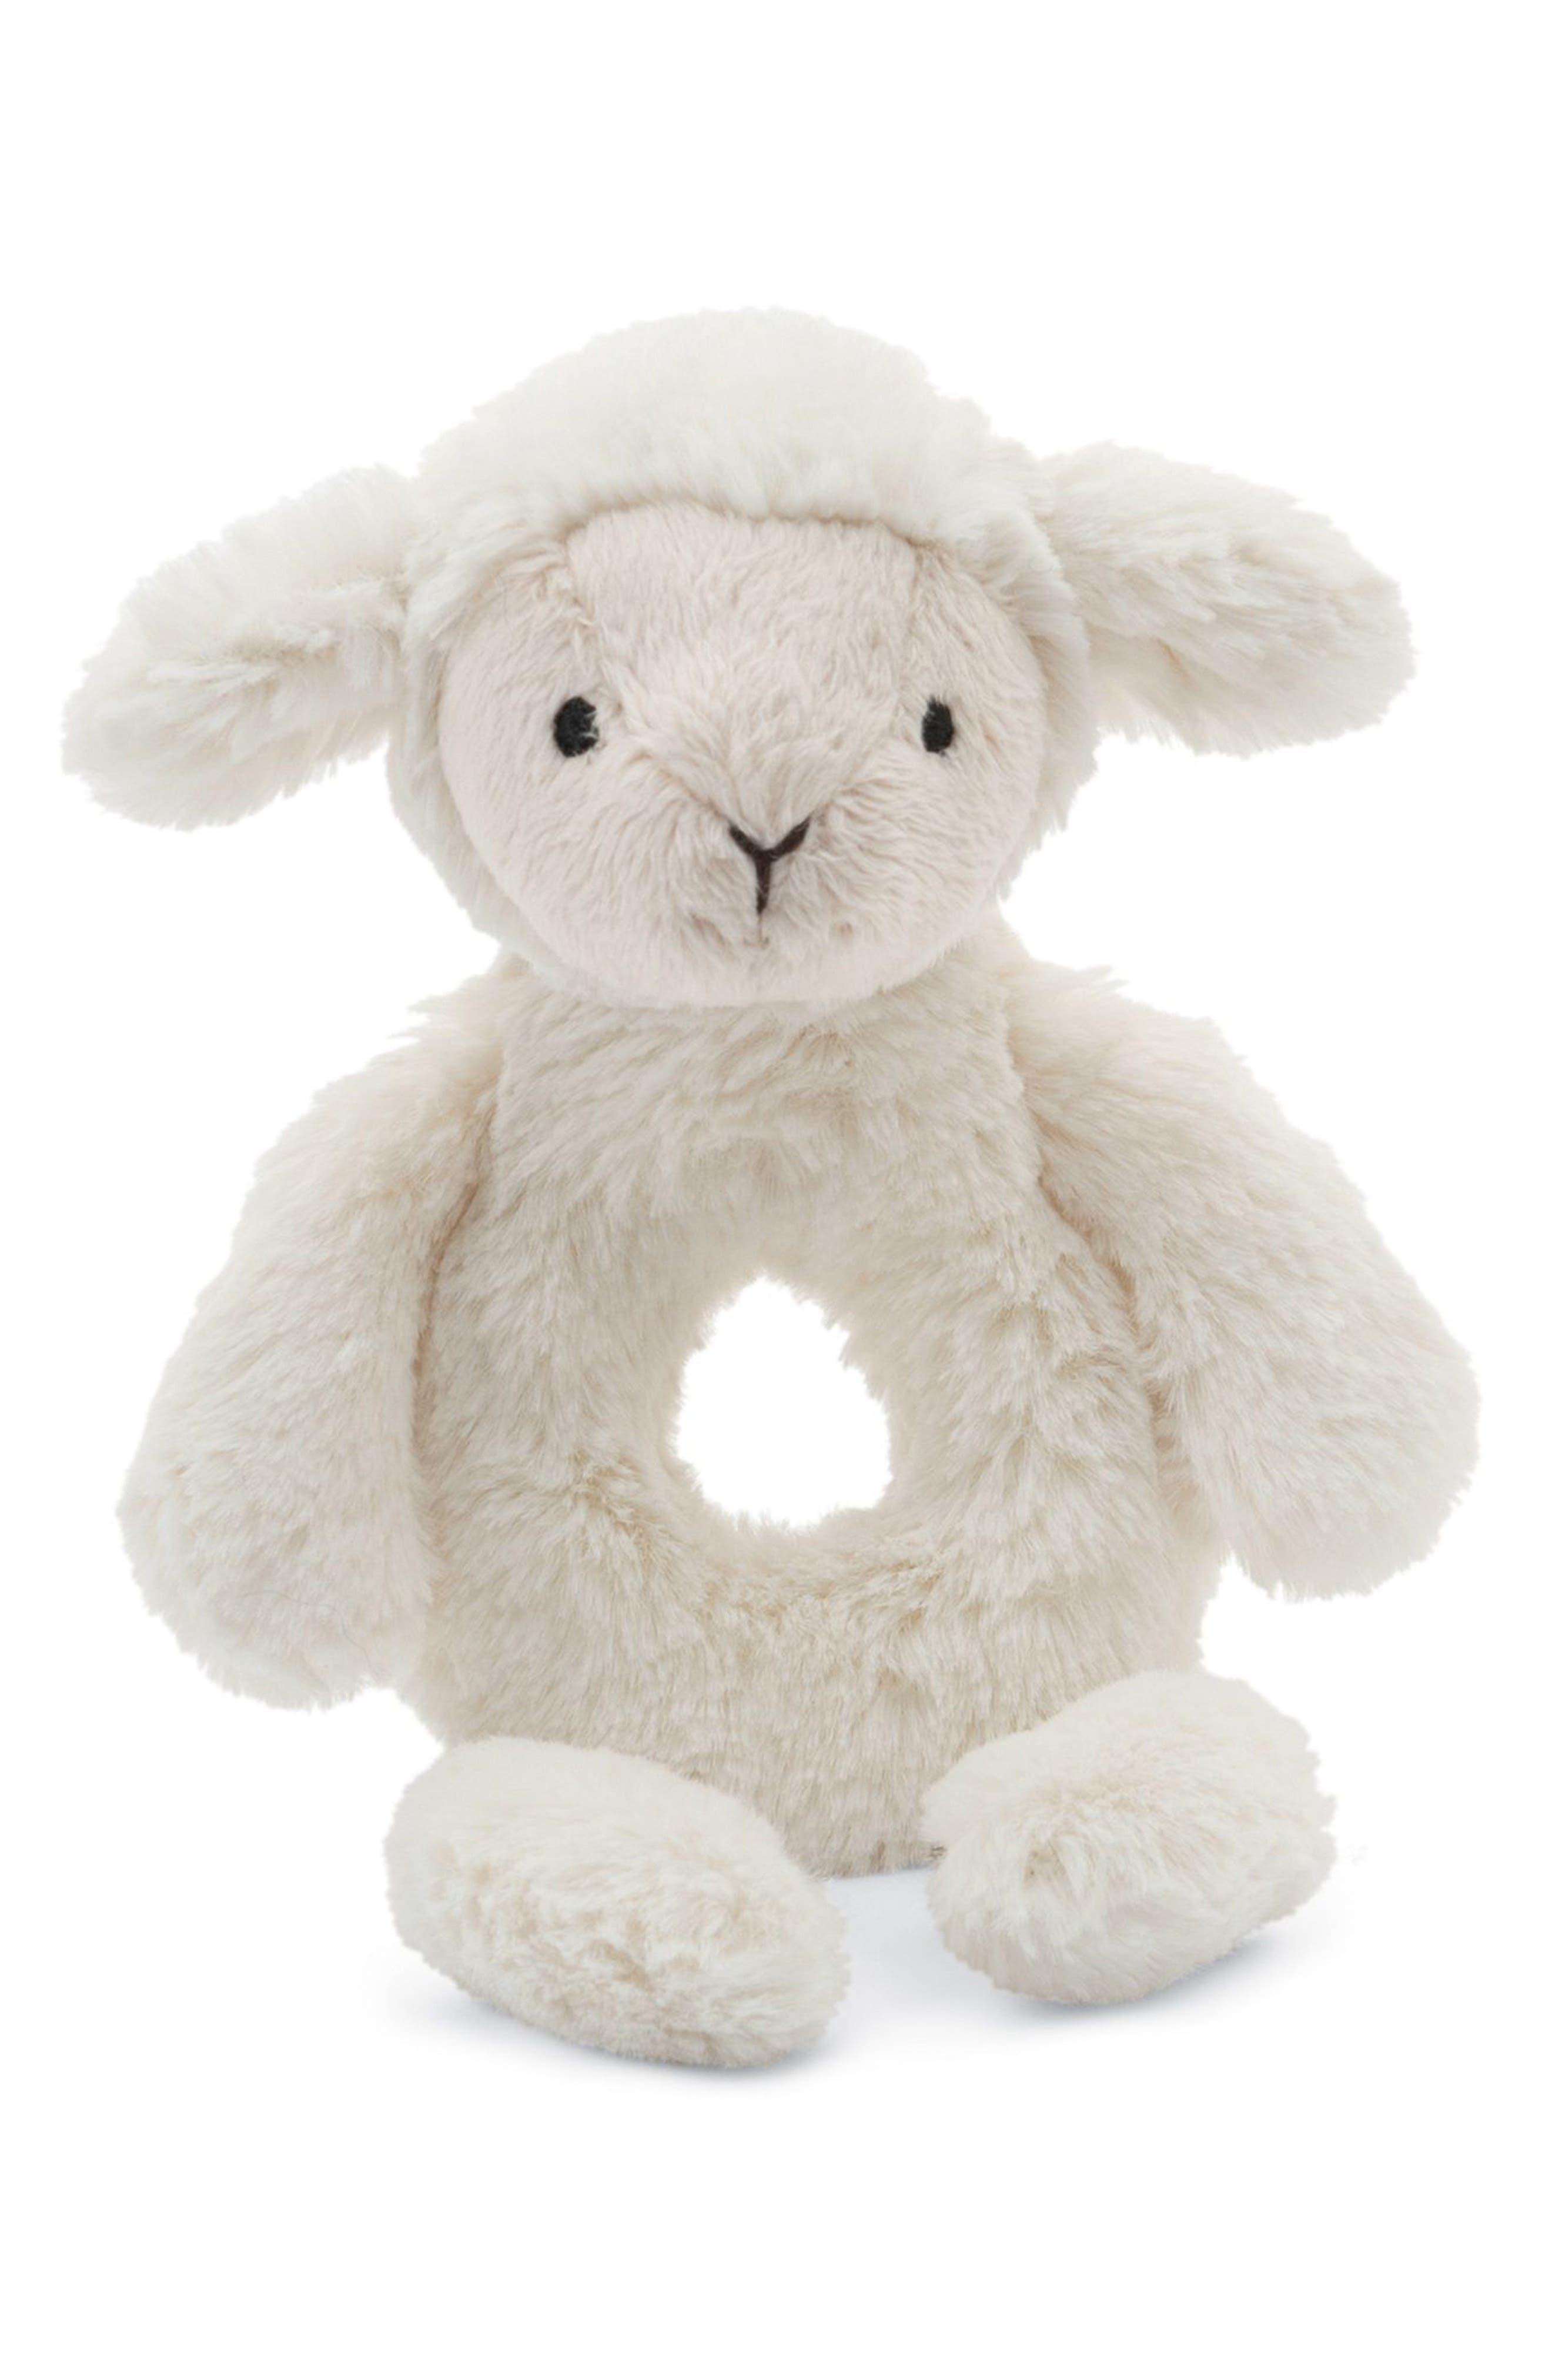 Jellycat Bashful Lamb Grabber Rattle